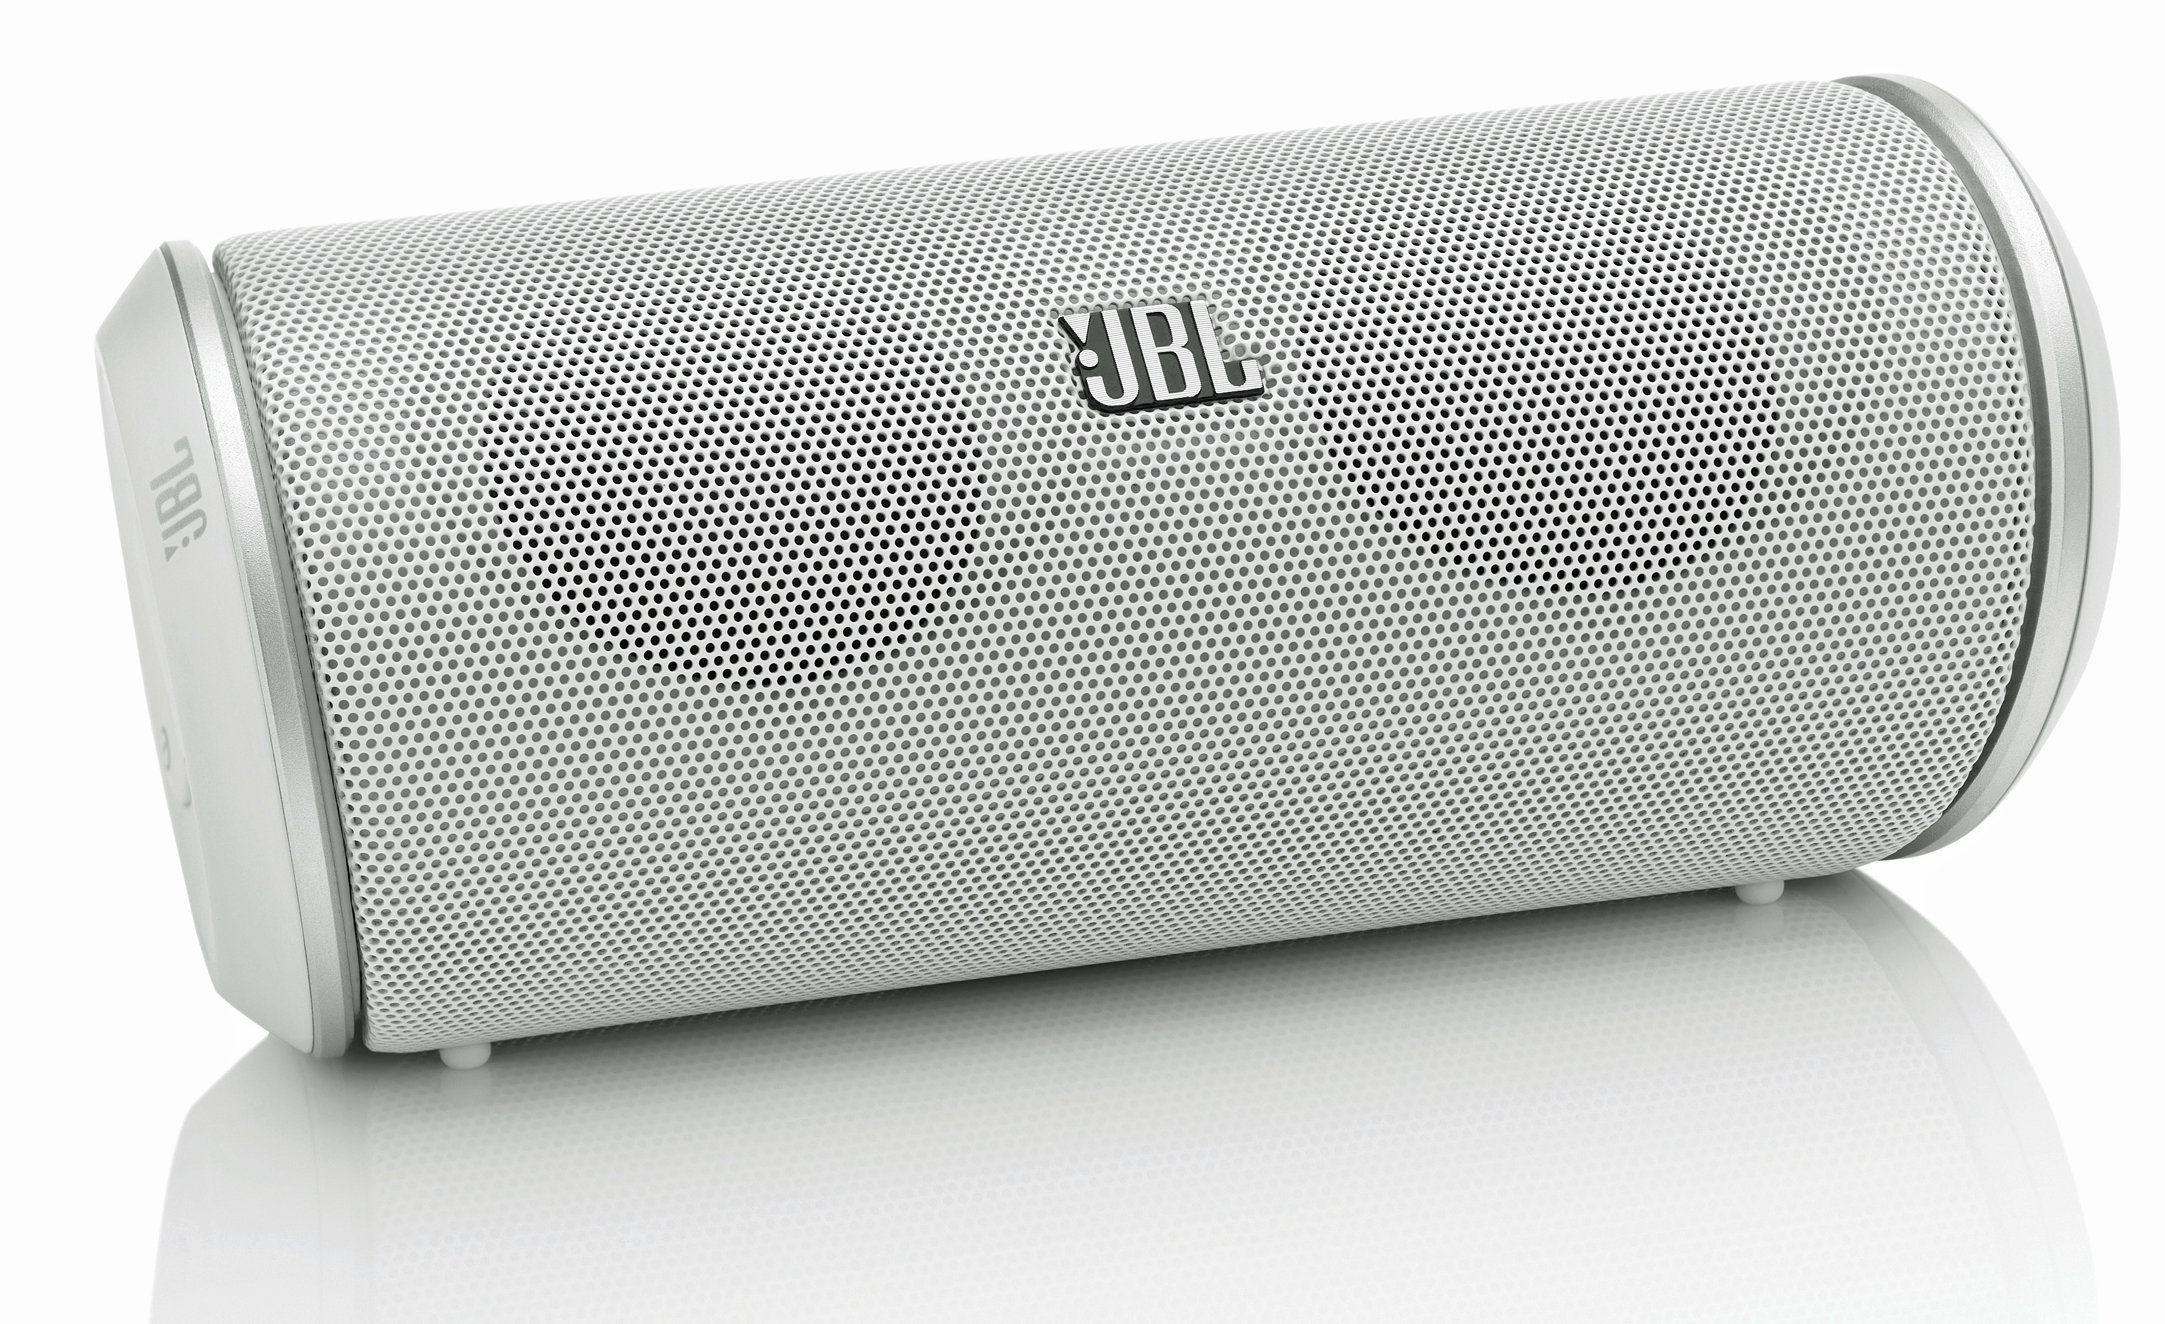 Original JBL Flip 1st Generation Portable Wireless Stereo Speaker Black NEW